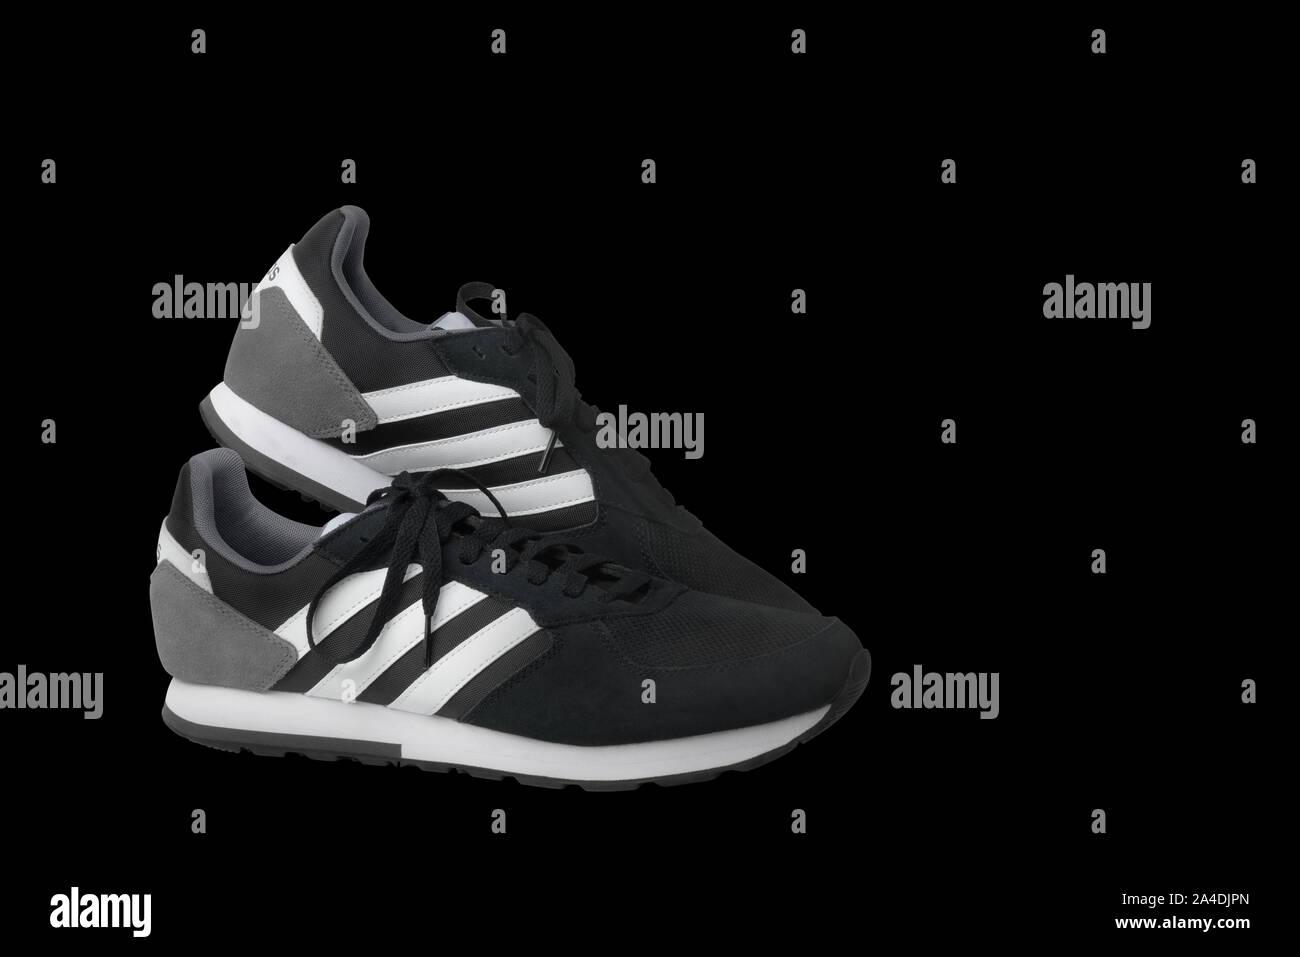 Sneakers Isolated Stockfotos & Sneakers Isolated Bilder Alamy